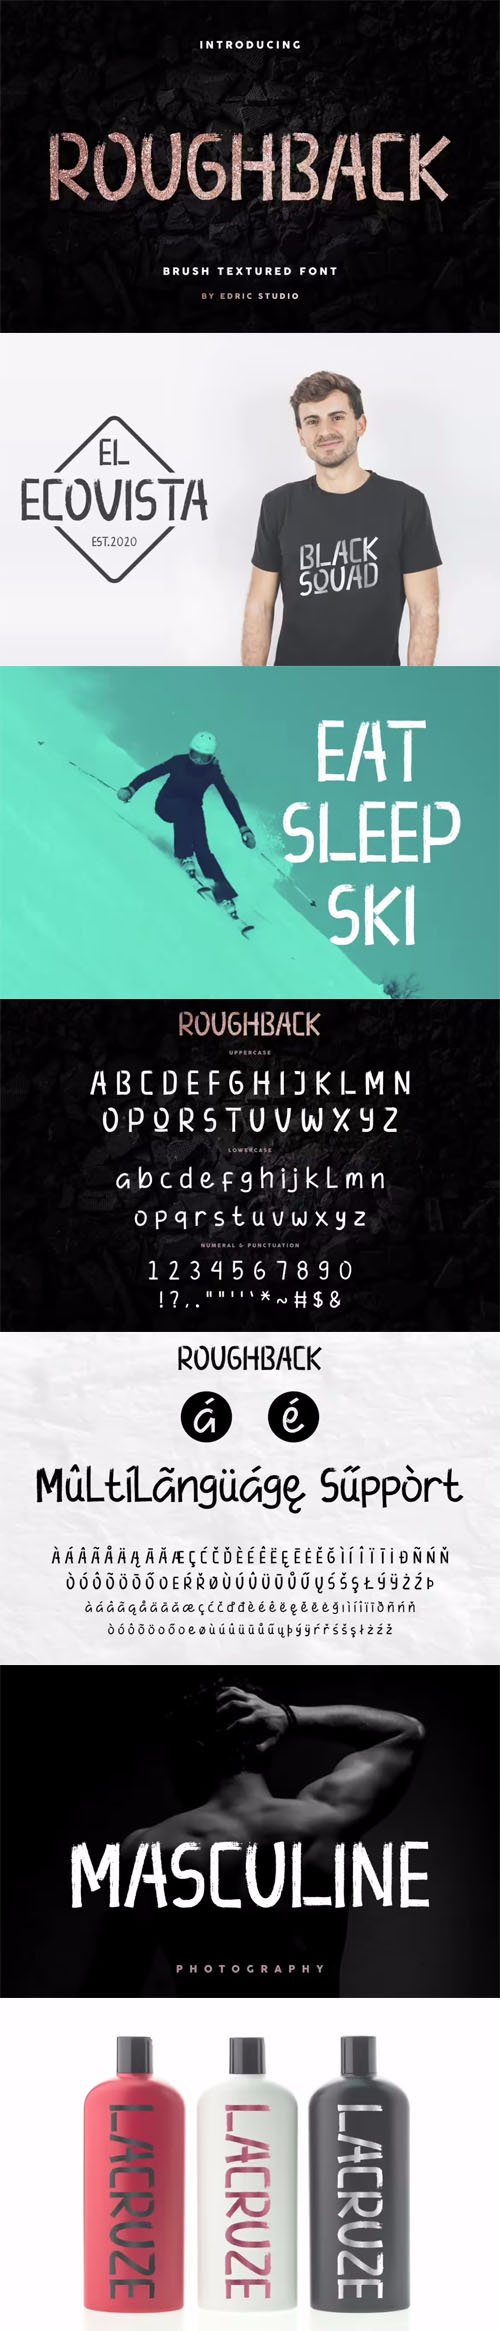 Roughback Script - Rough Brush Textured Typeface